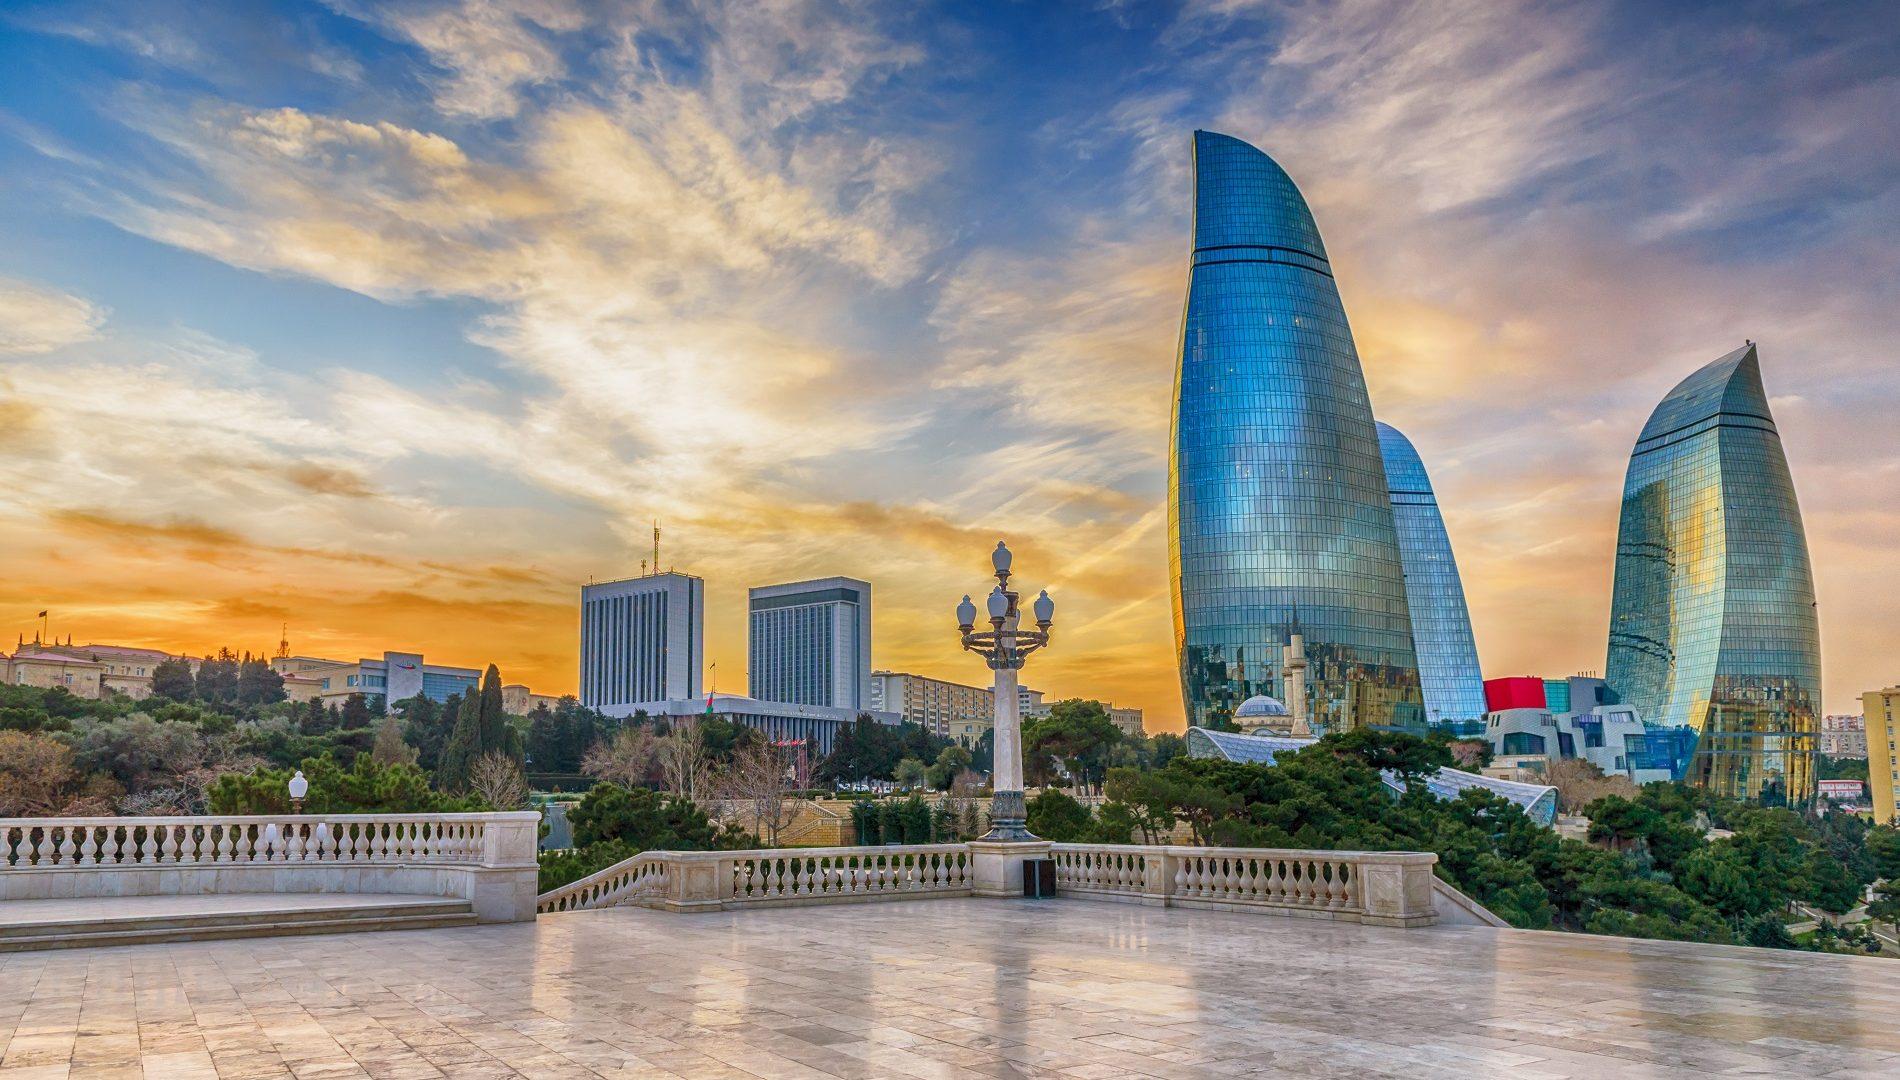 Trovare lavoro in Azerbaijan